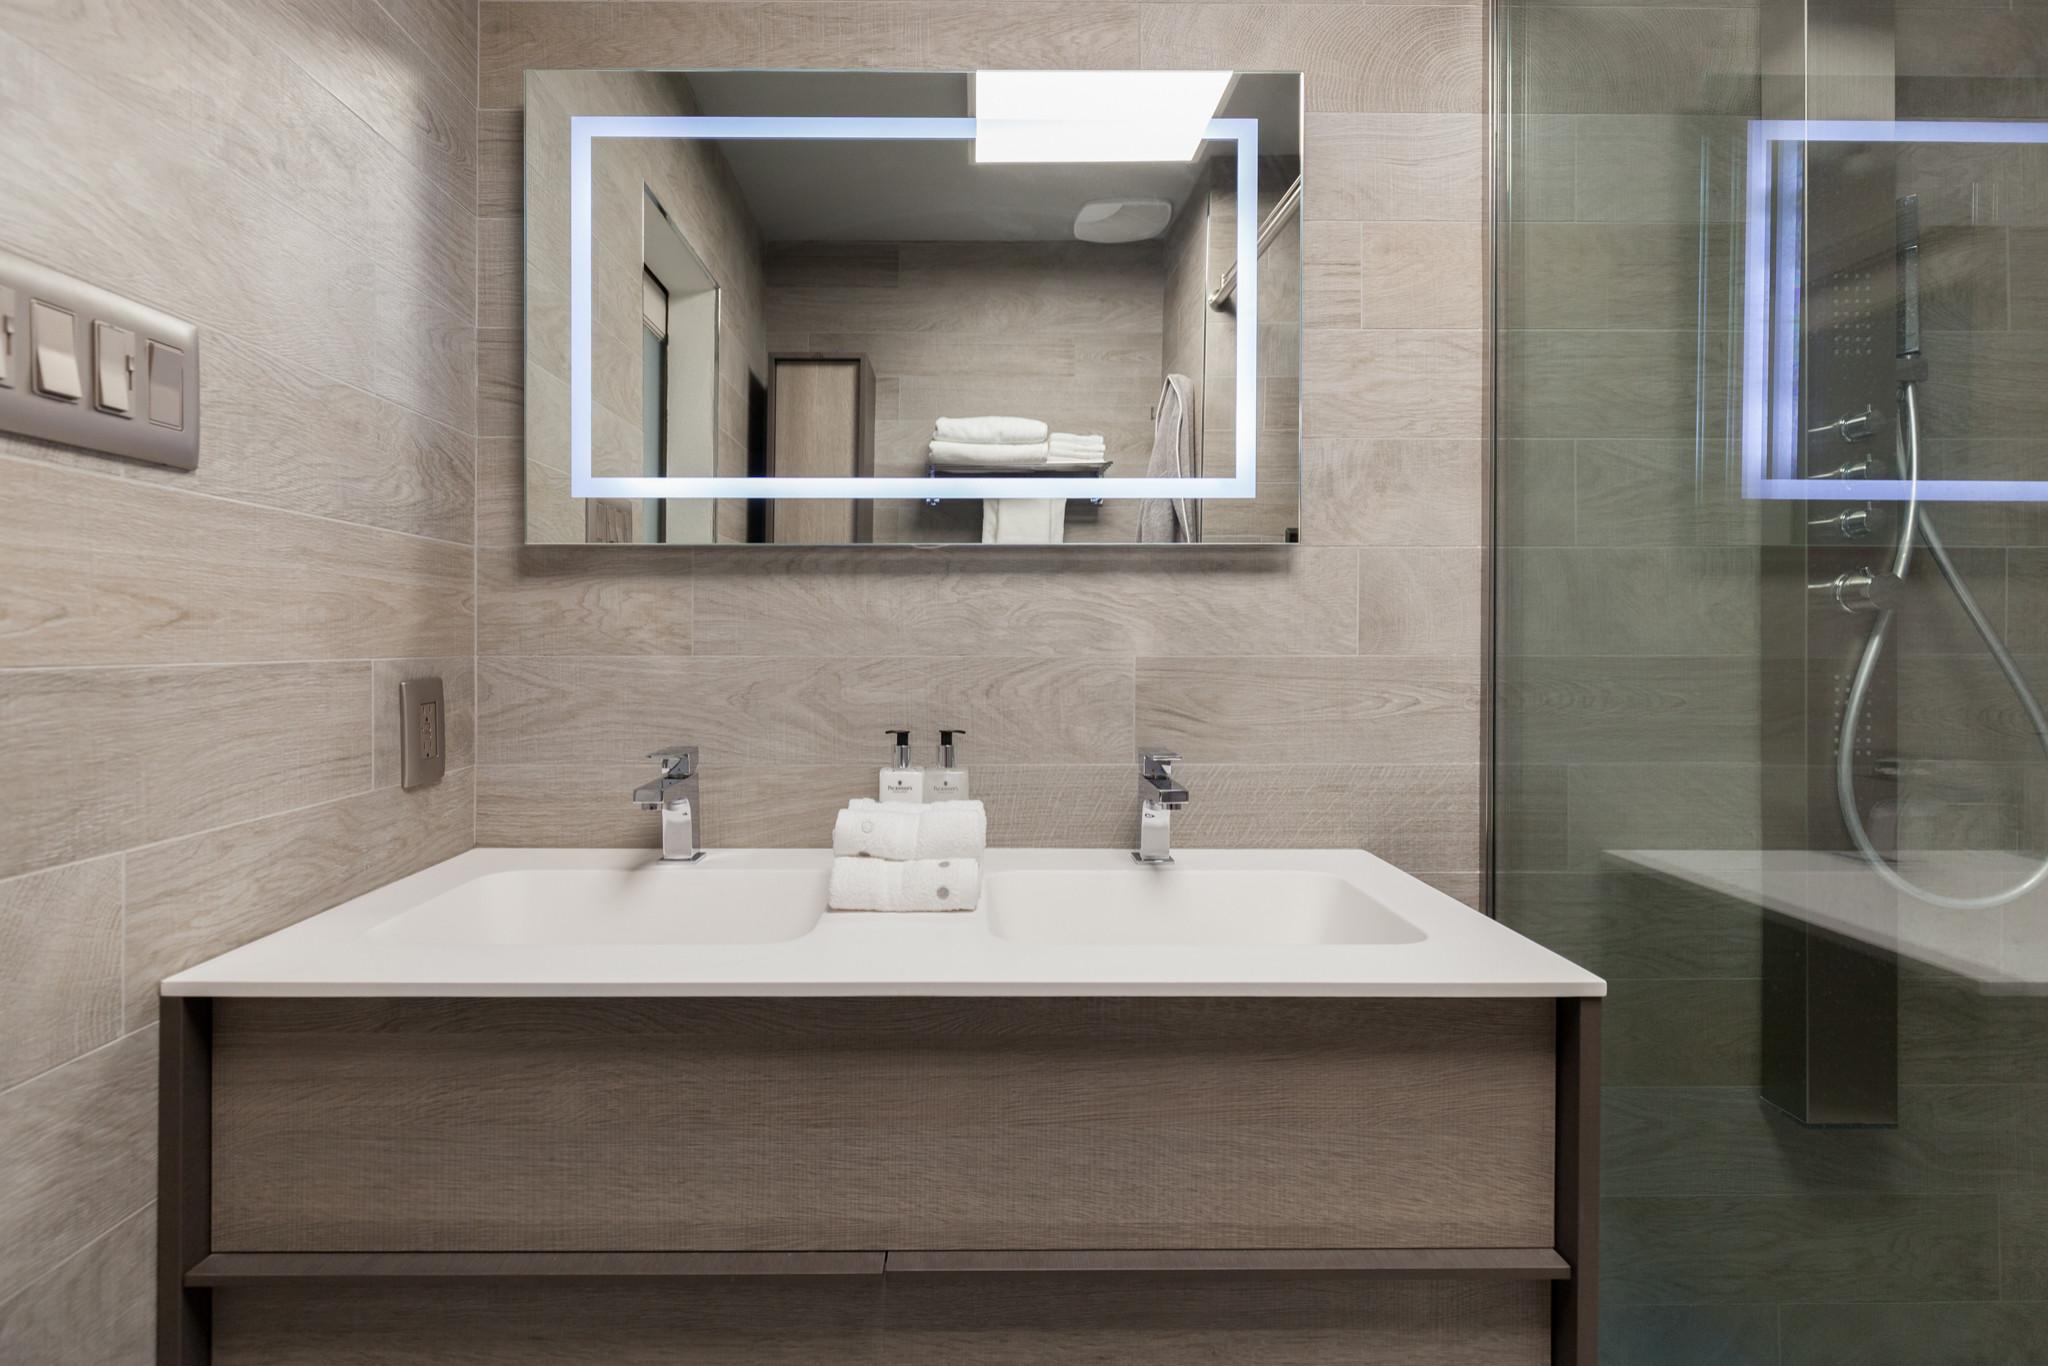 Small Contemporary Bath Renovation